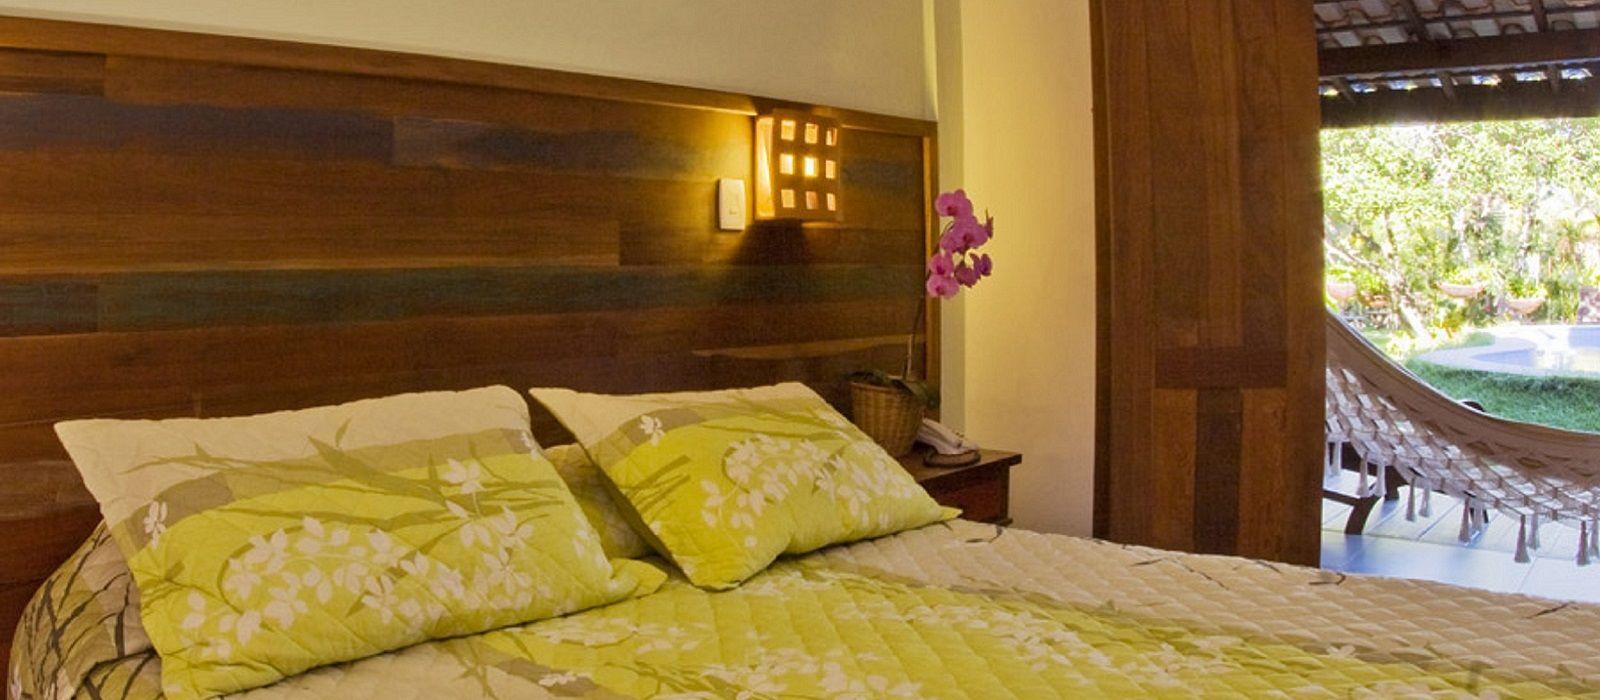 Hotel Casa do Forte Brazil